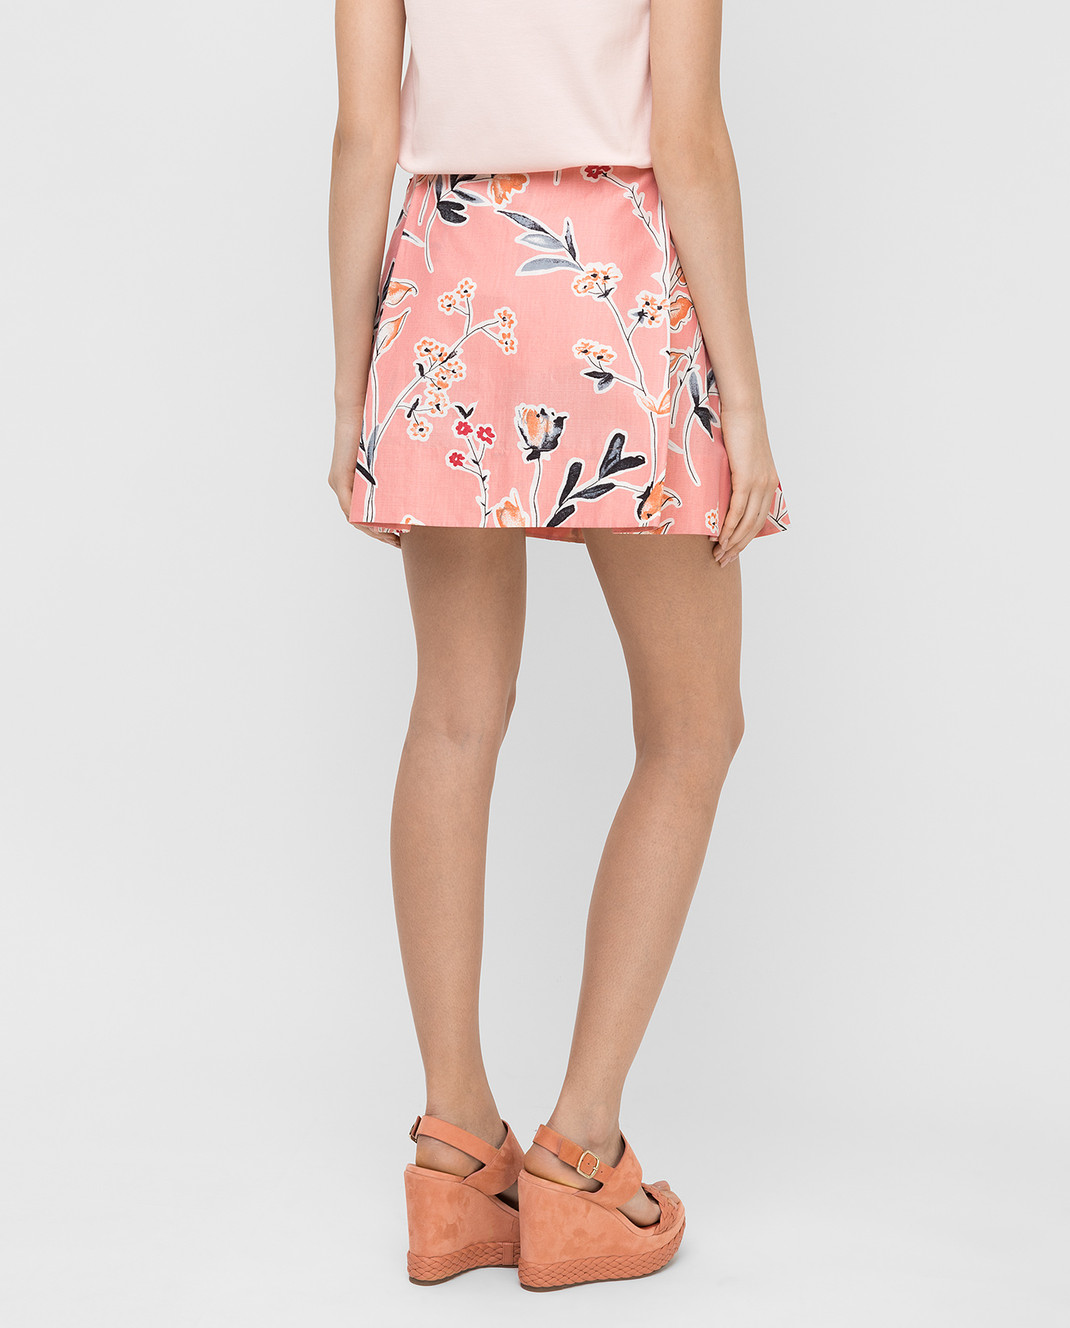 Marni Розовая юбка GOMAR35A00TCR58 изображение 4